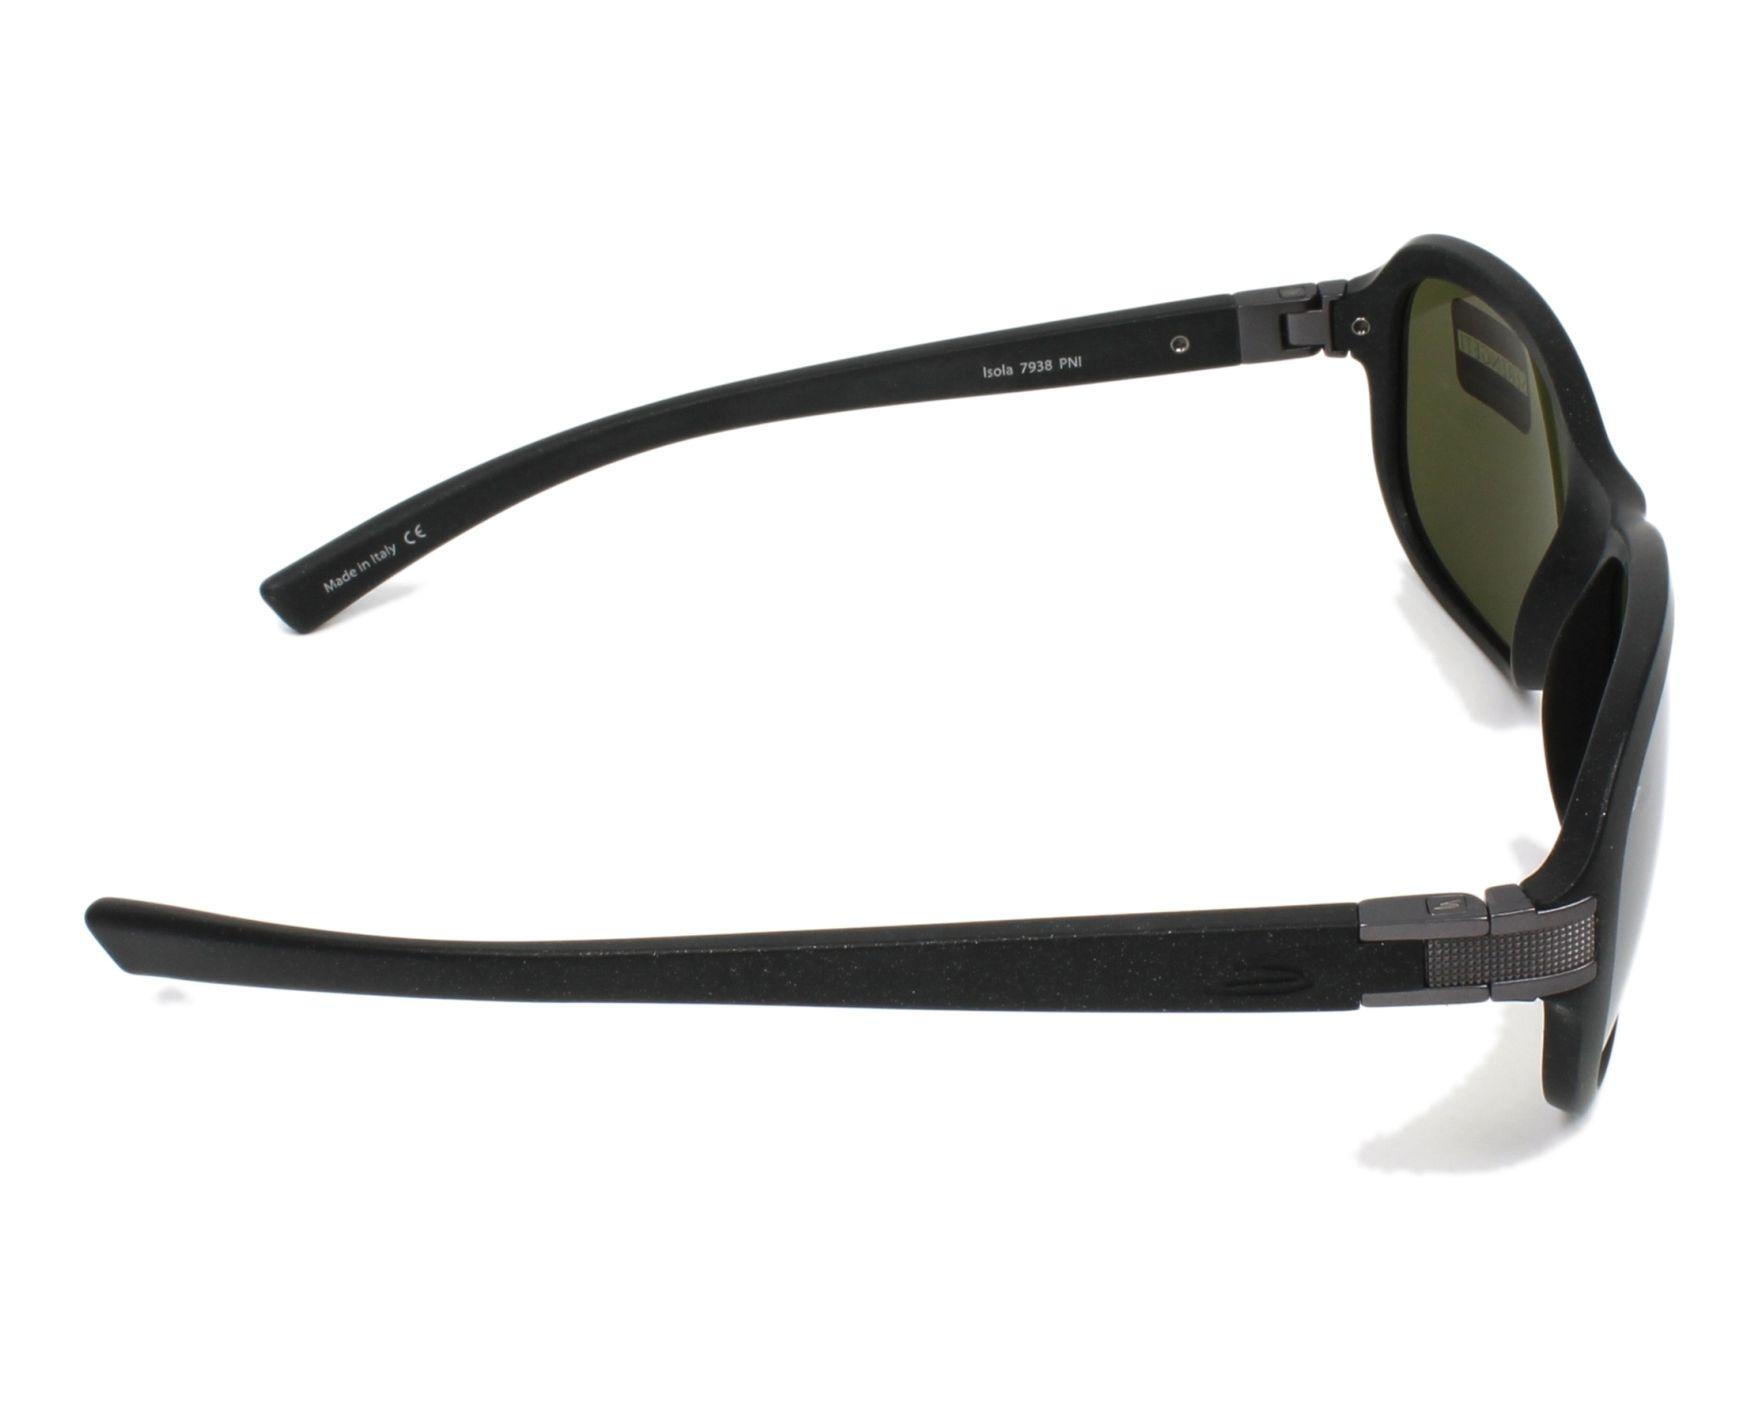 677b2d24cbd Sunglasses Serengeti ISOLA 7938 60-12 Black Gun side view